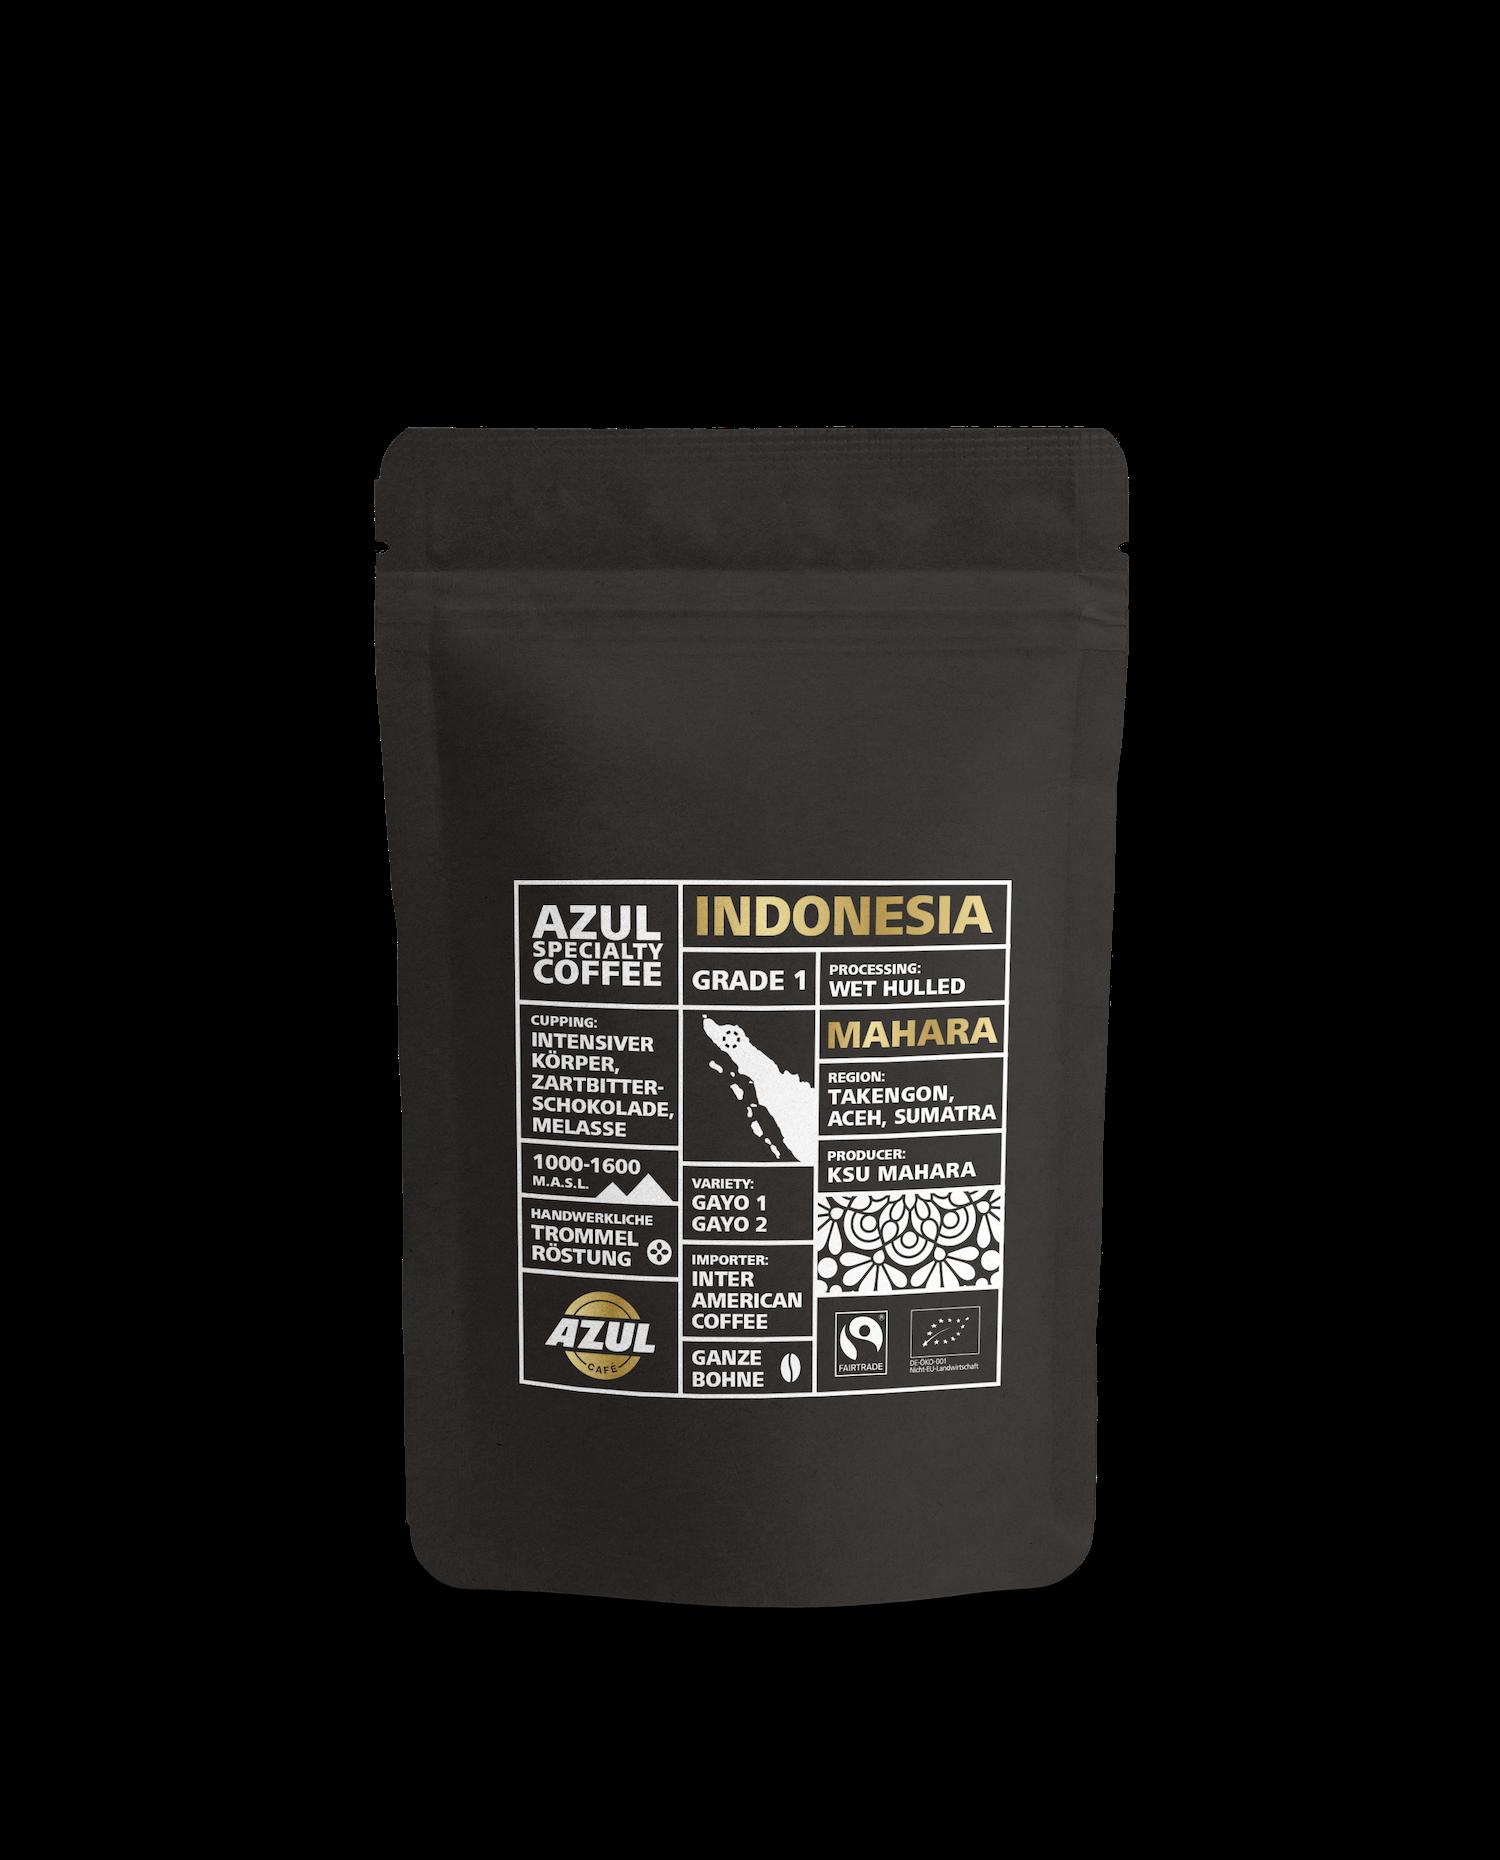 Azul Kaffee – Specialty Coffee Indonesia Mahara